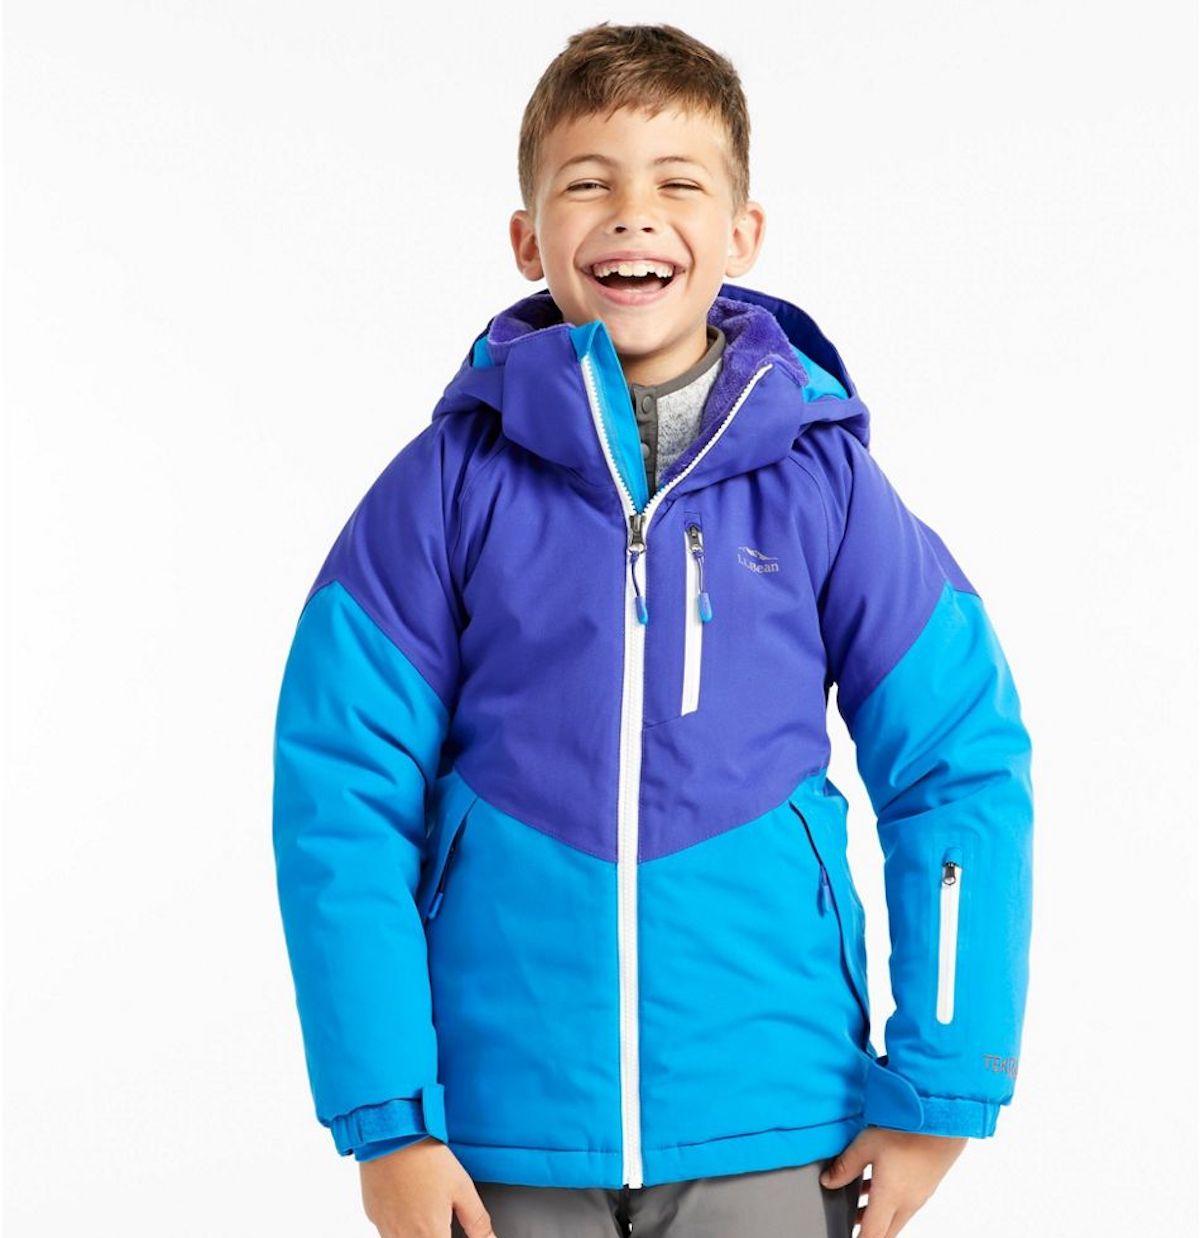 boy wearing blue and purple coat